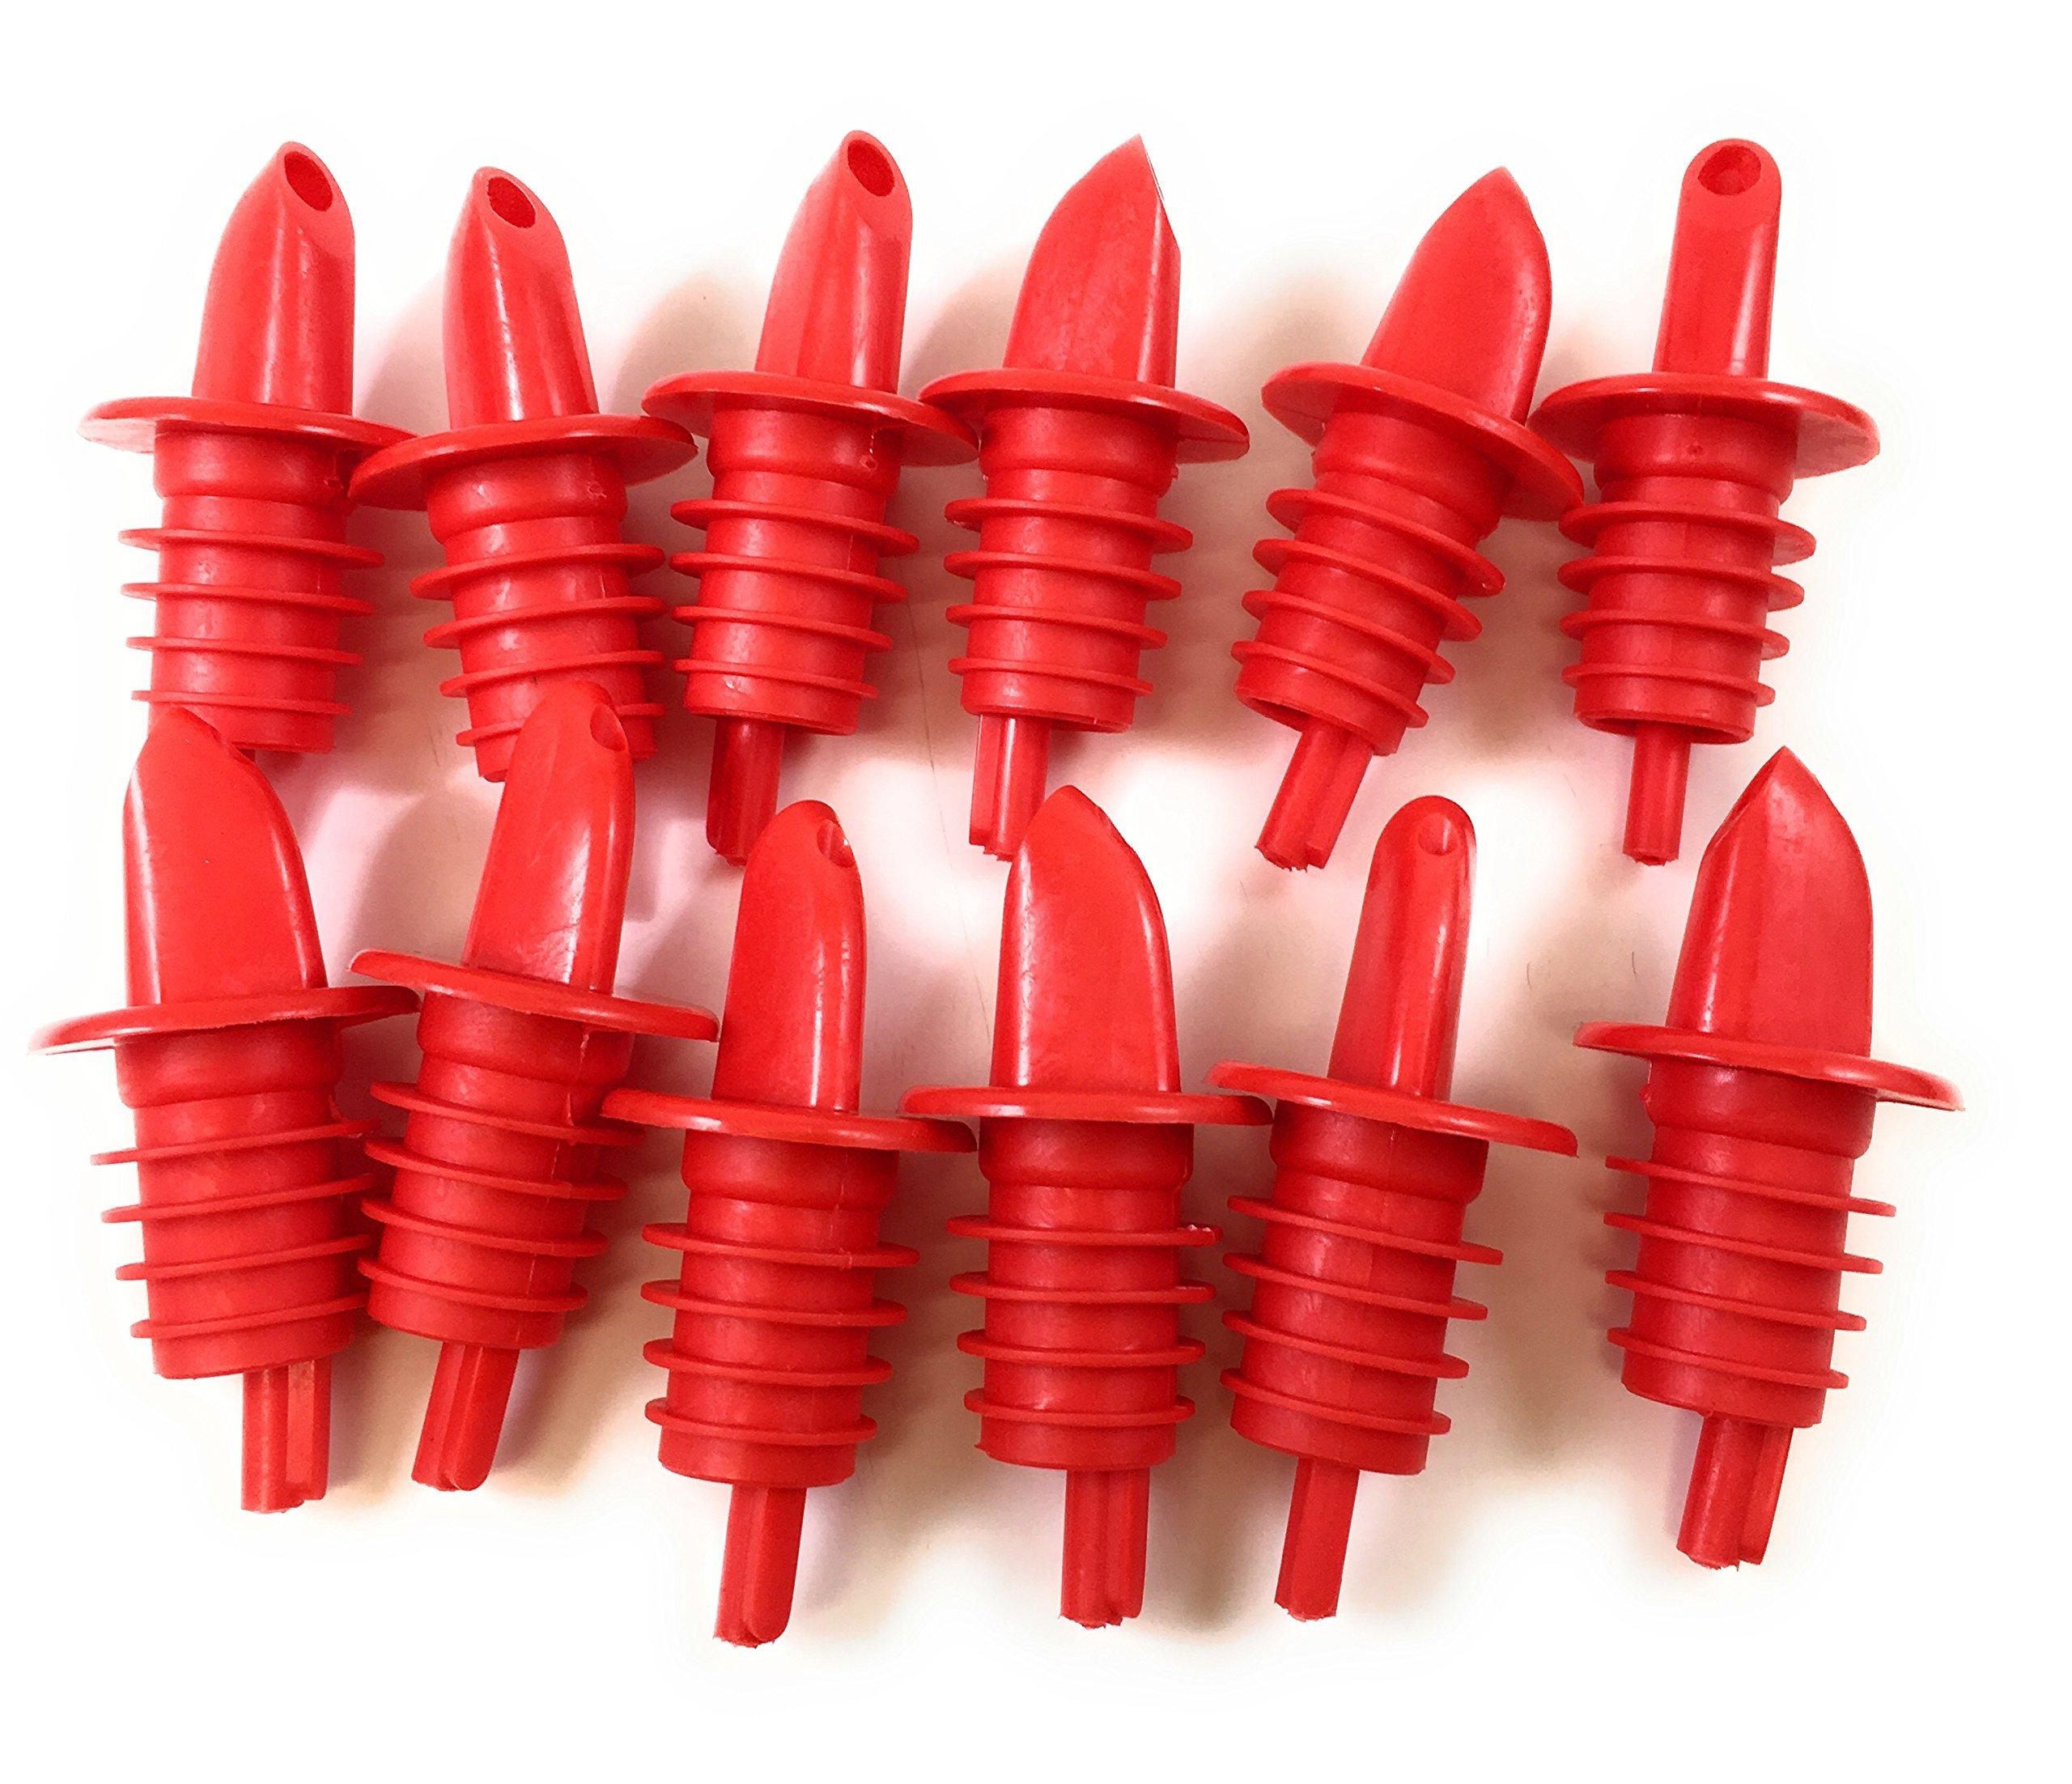 Barwareaffair Free-Flow Plastic Liquor Bottle Speed Pourers (Red) by Barwareaffair